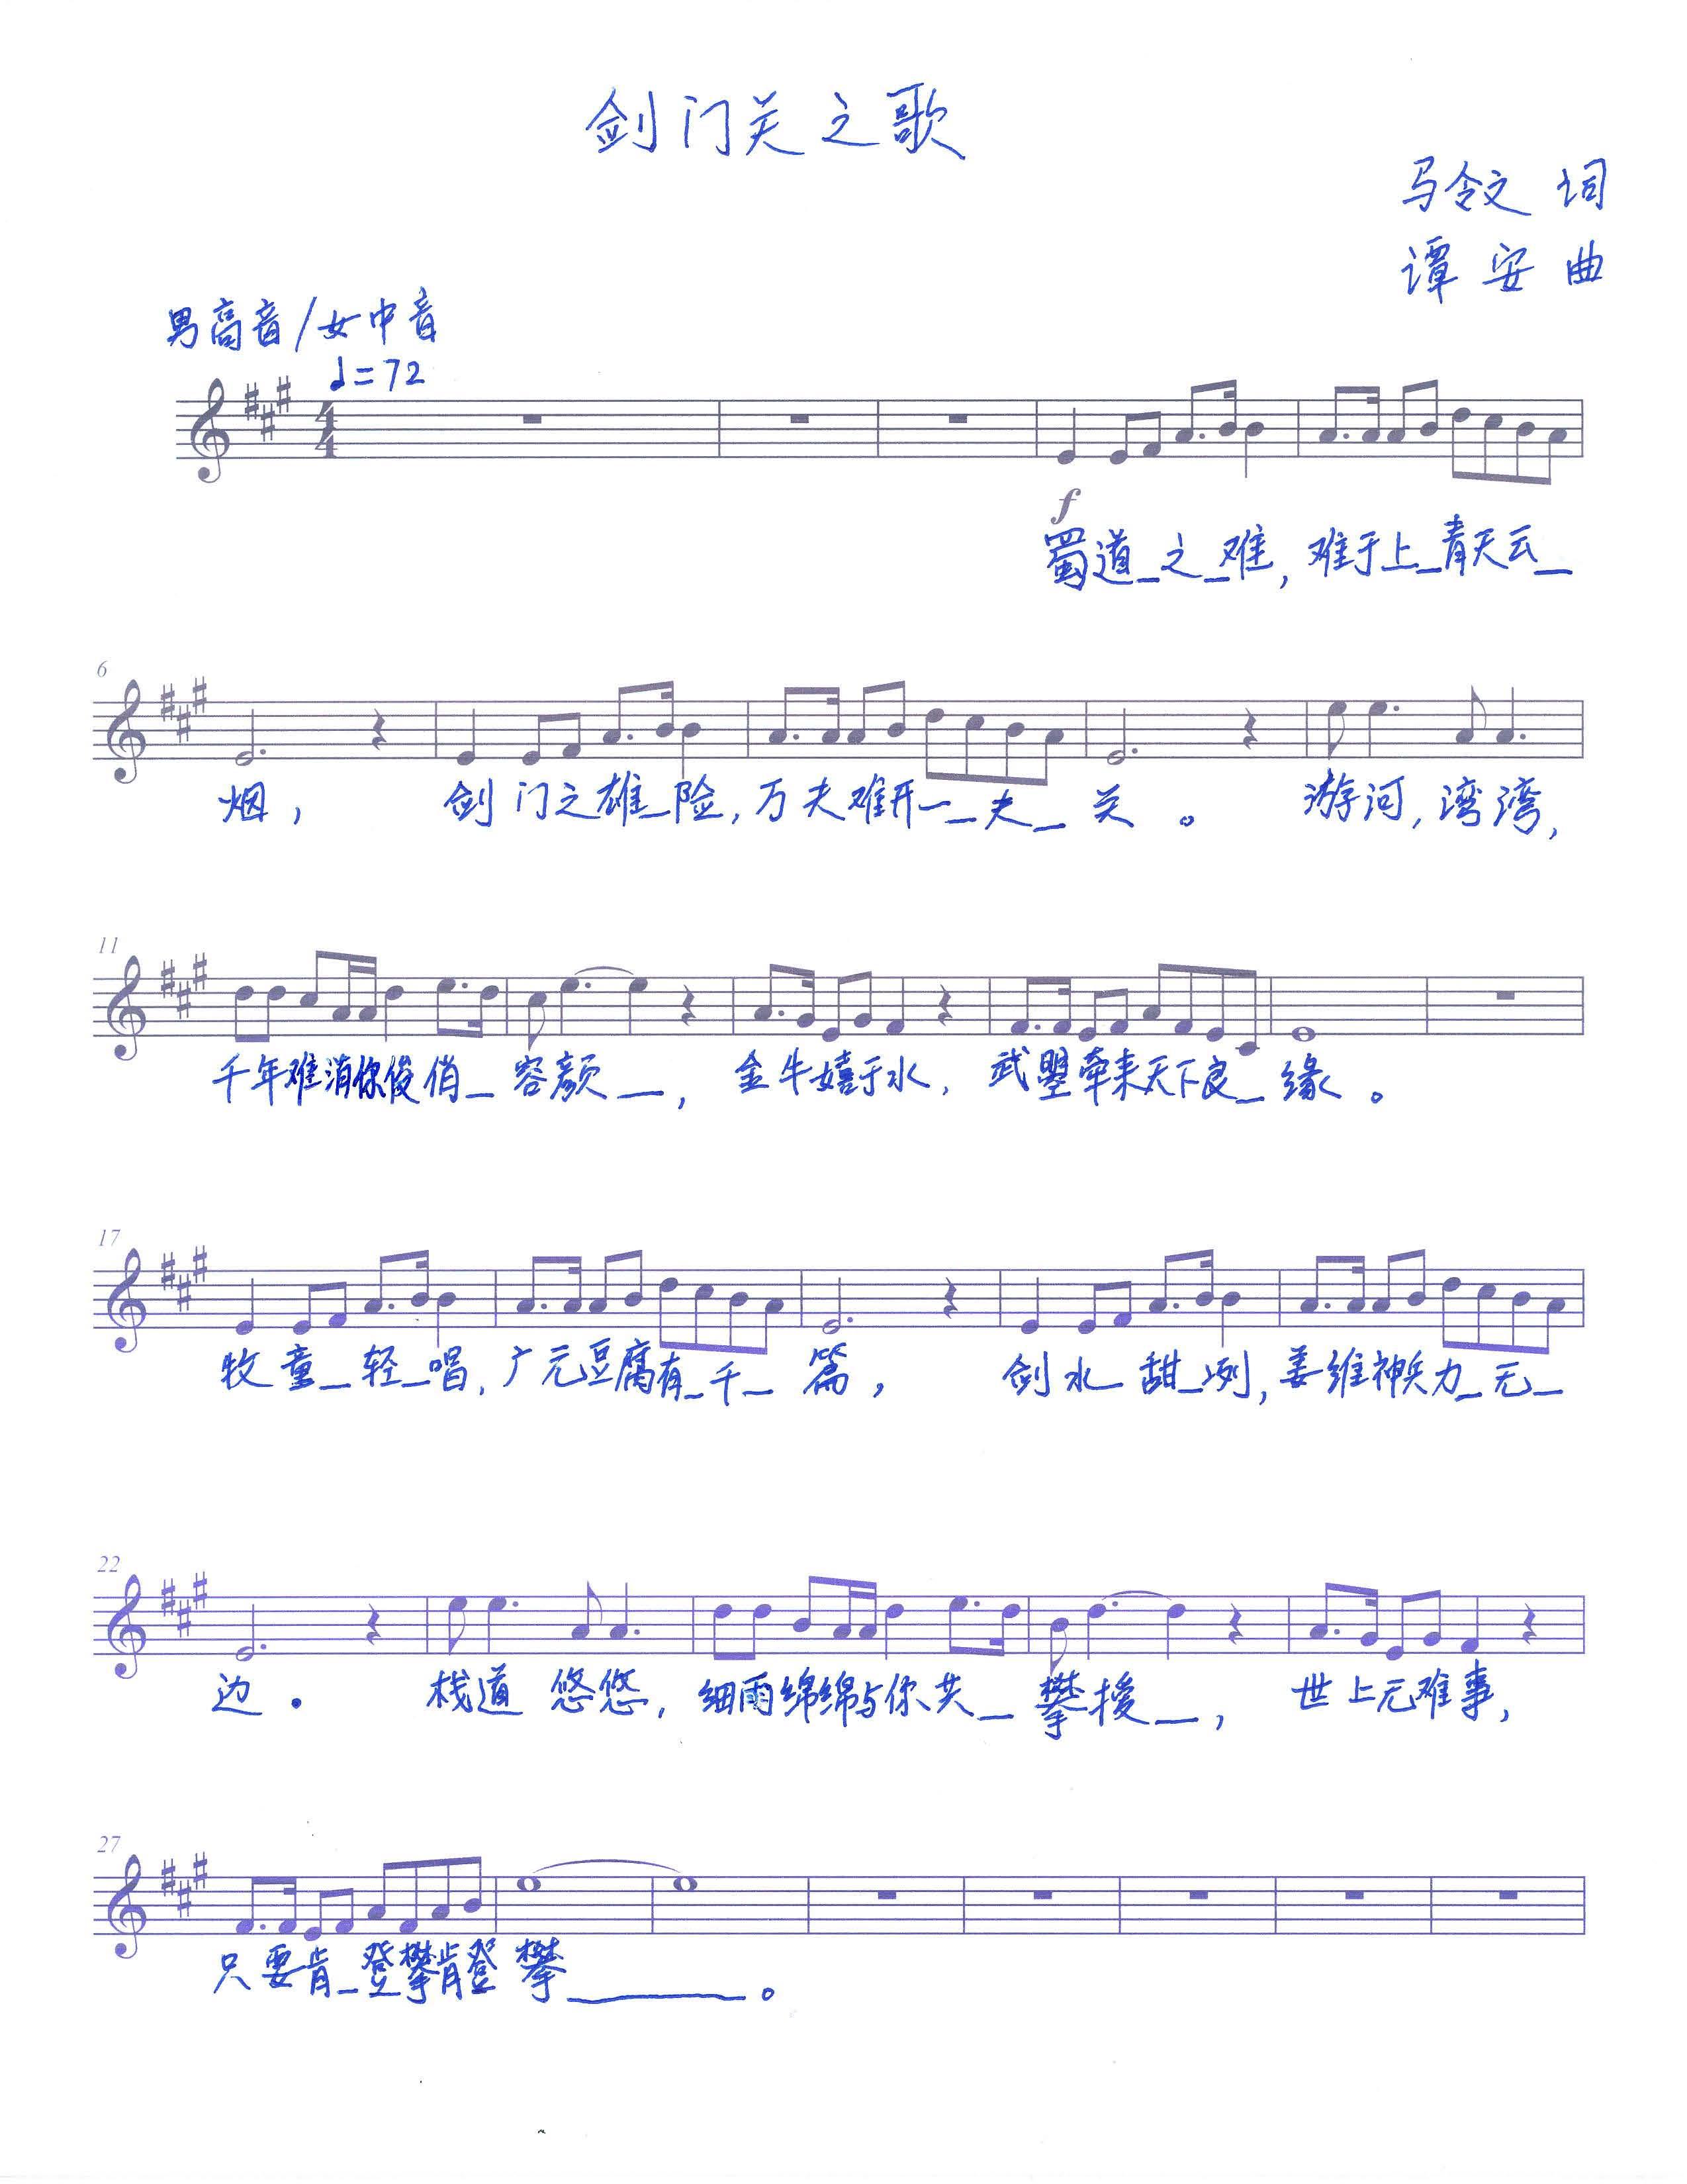 song曲谱